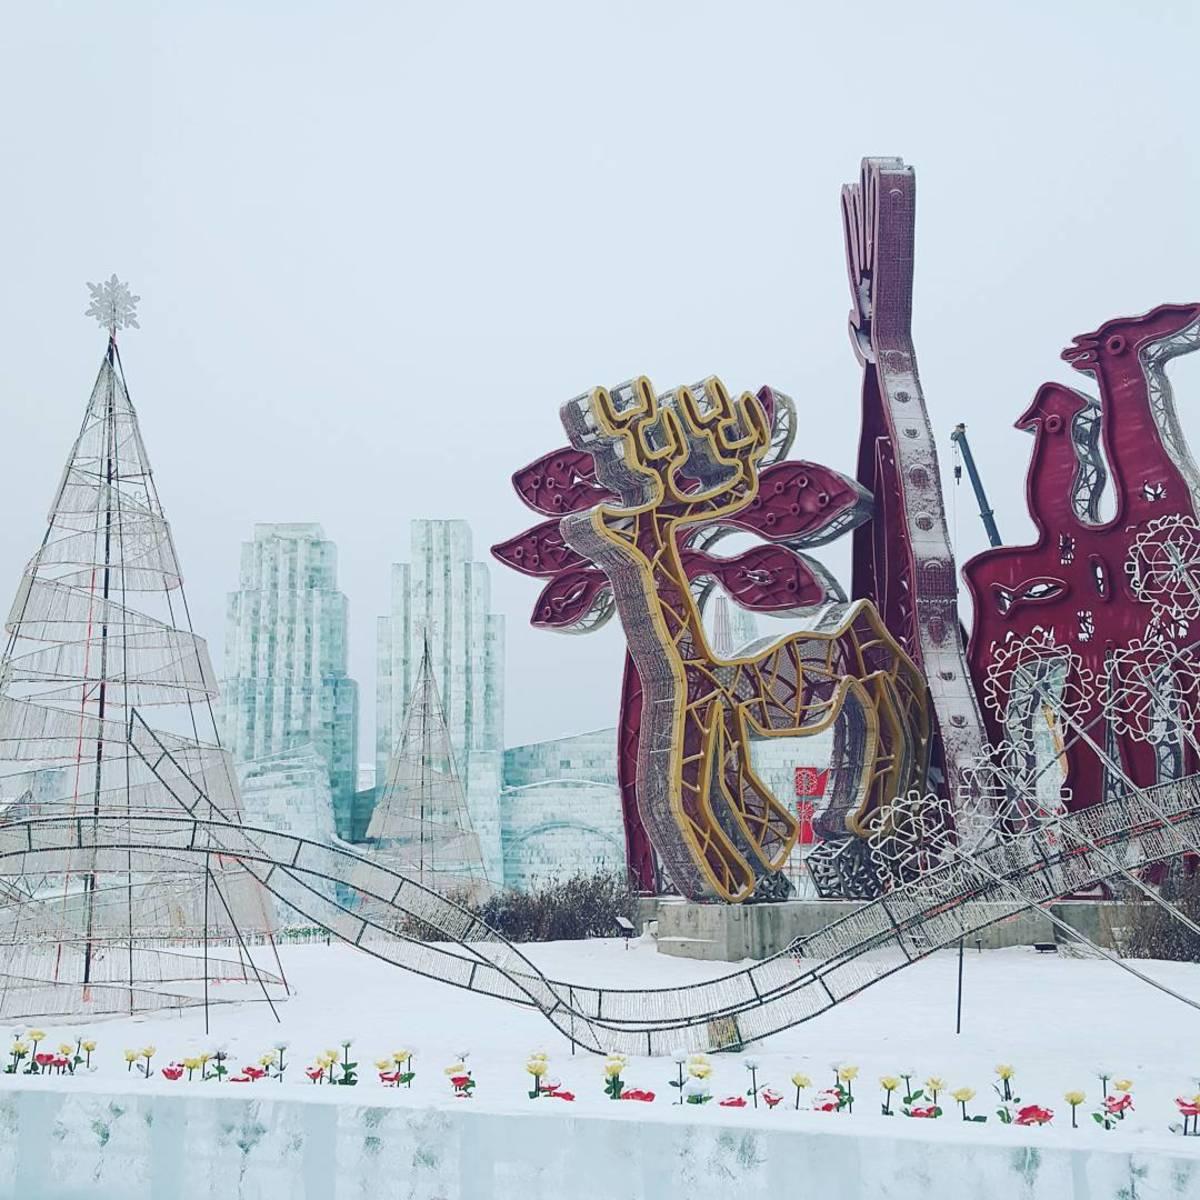 Visit the Harbin Ice Festival